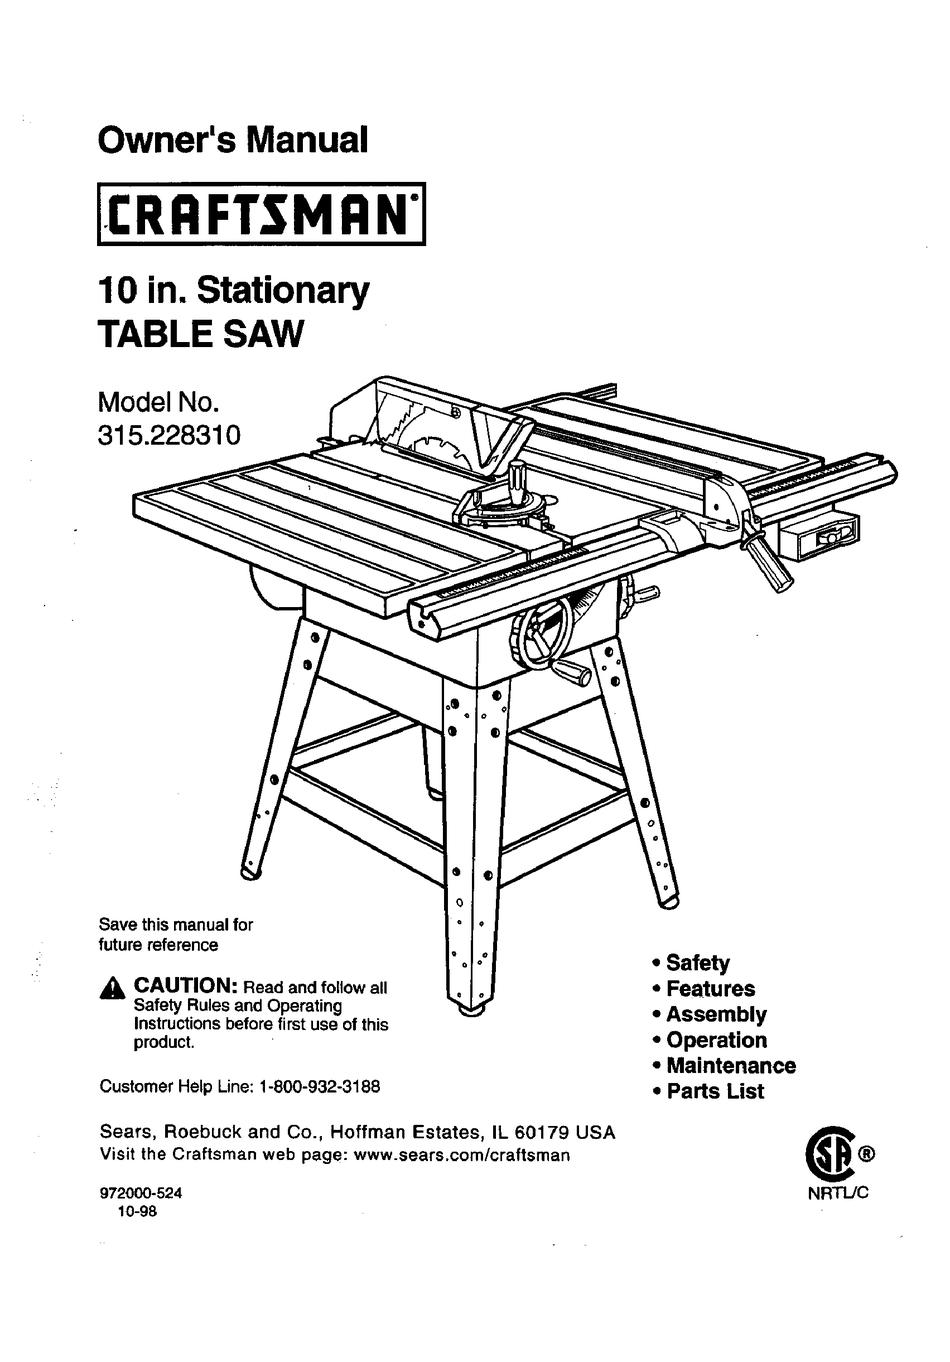 CRAFTSMAN TABLE SAW 315.22831 OWNER'S MANUAL Pdf Download